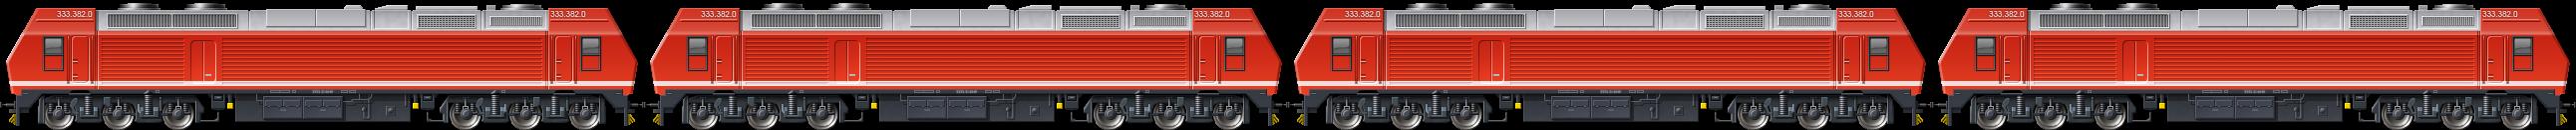 Acciona 333 Cargo I